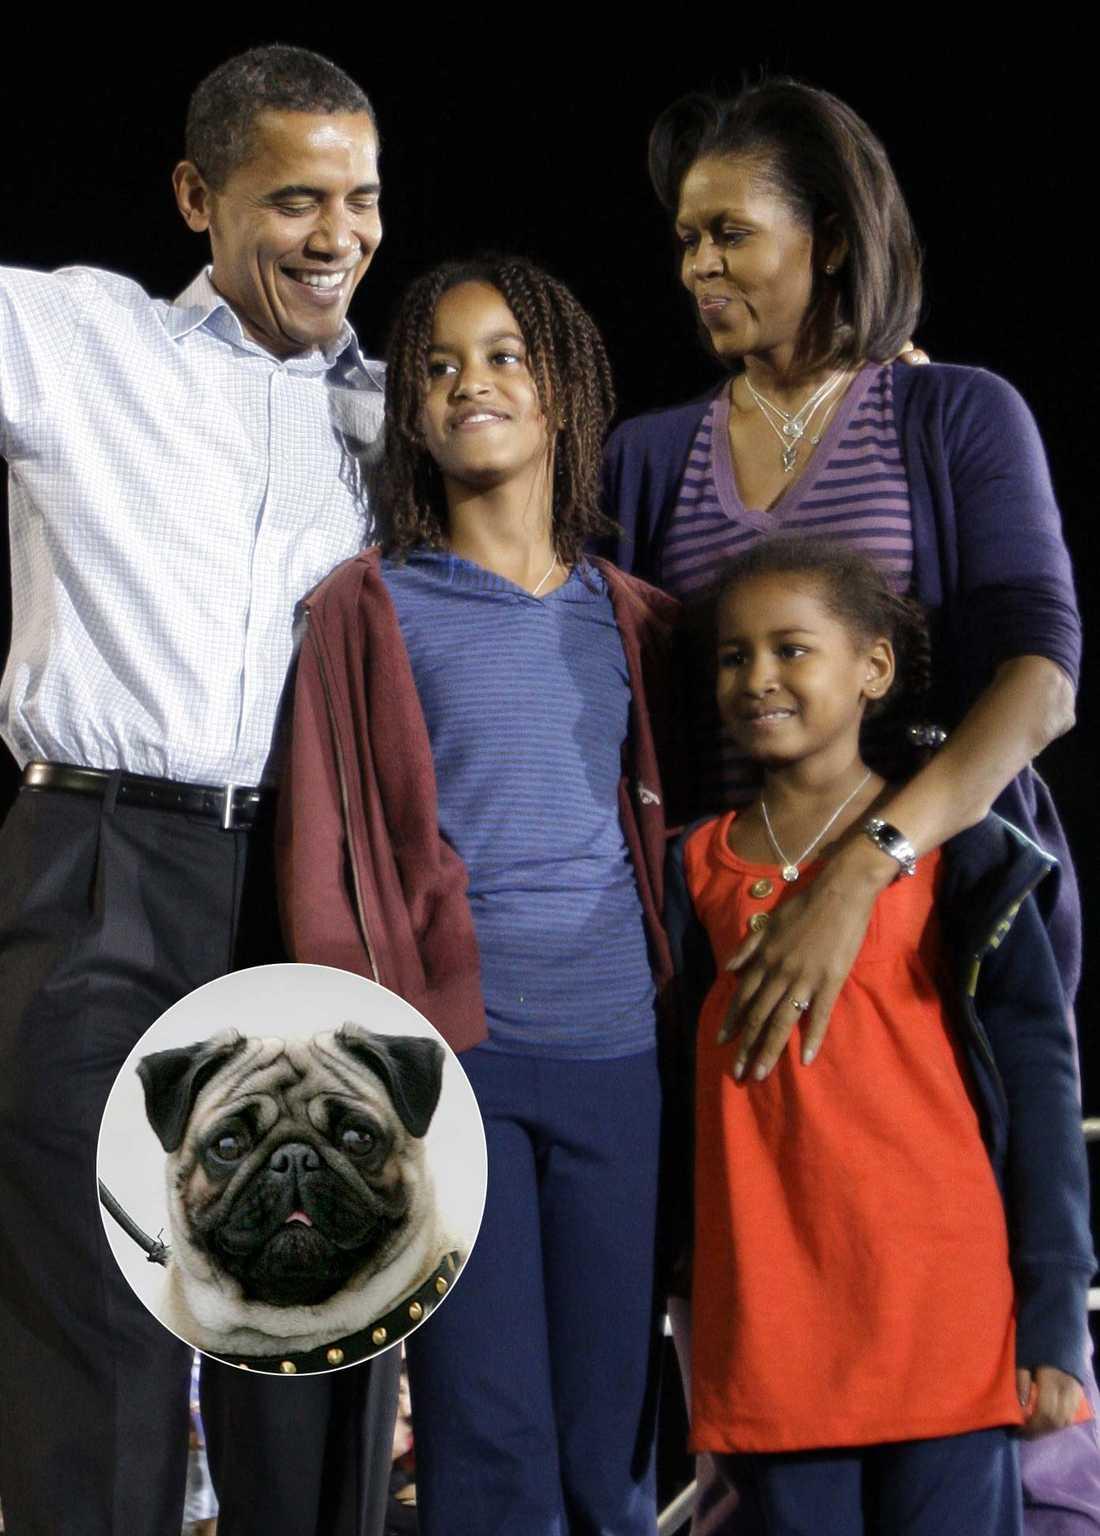 Kanske en mops? Det finns många små hundar som passar en barnfamilj, som Obamas, bra.